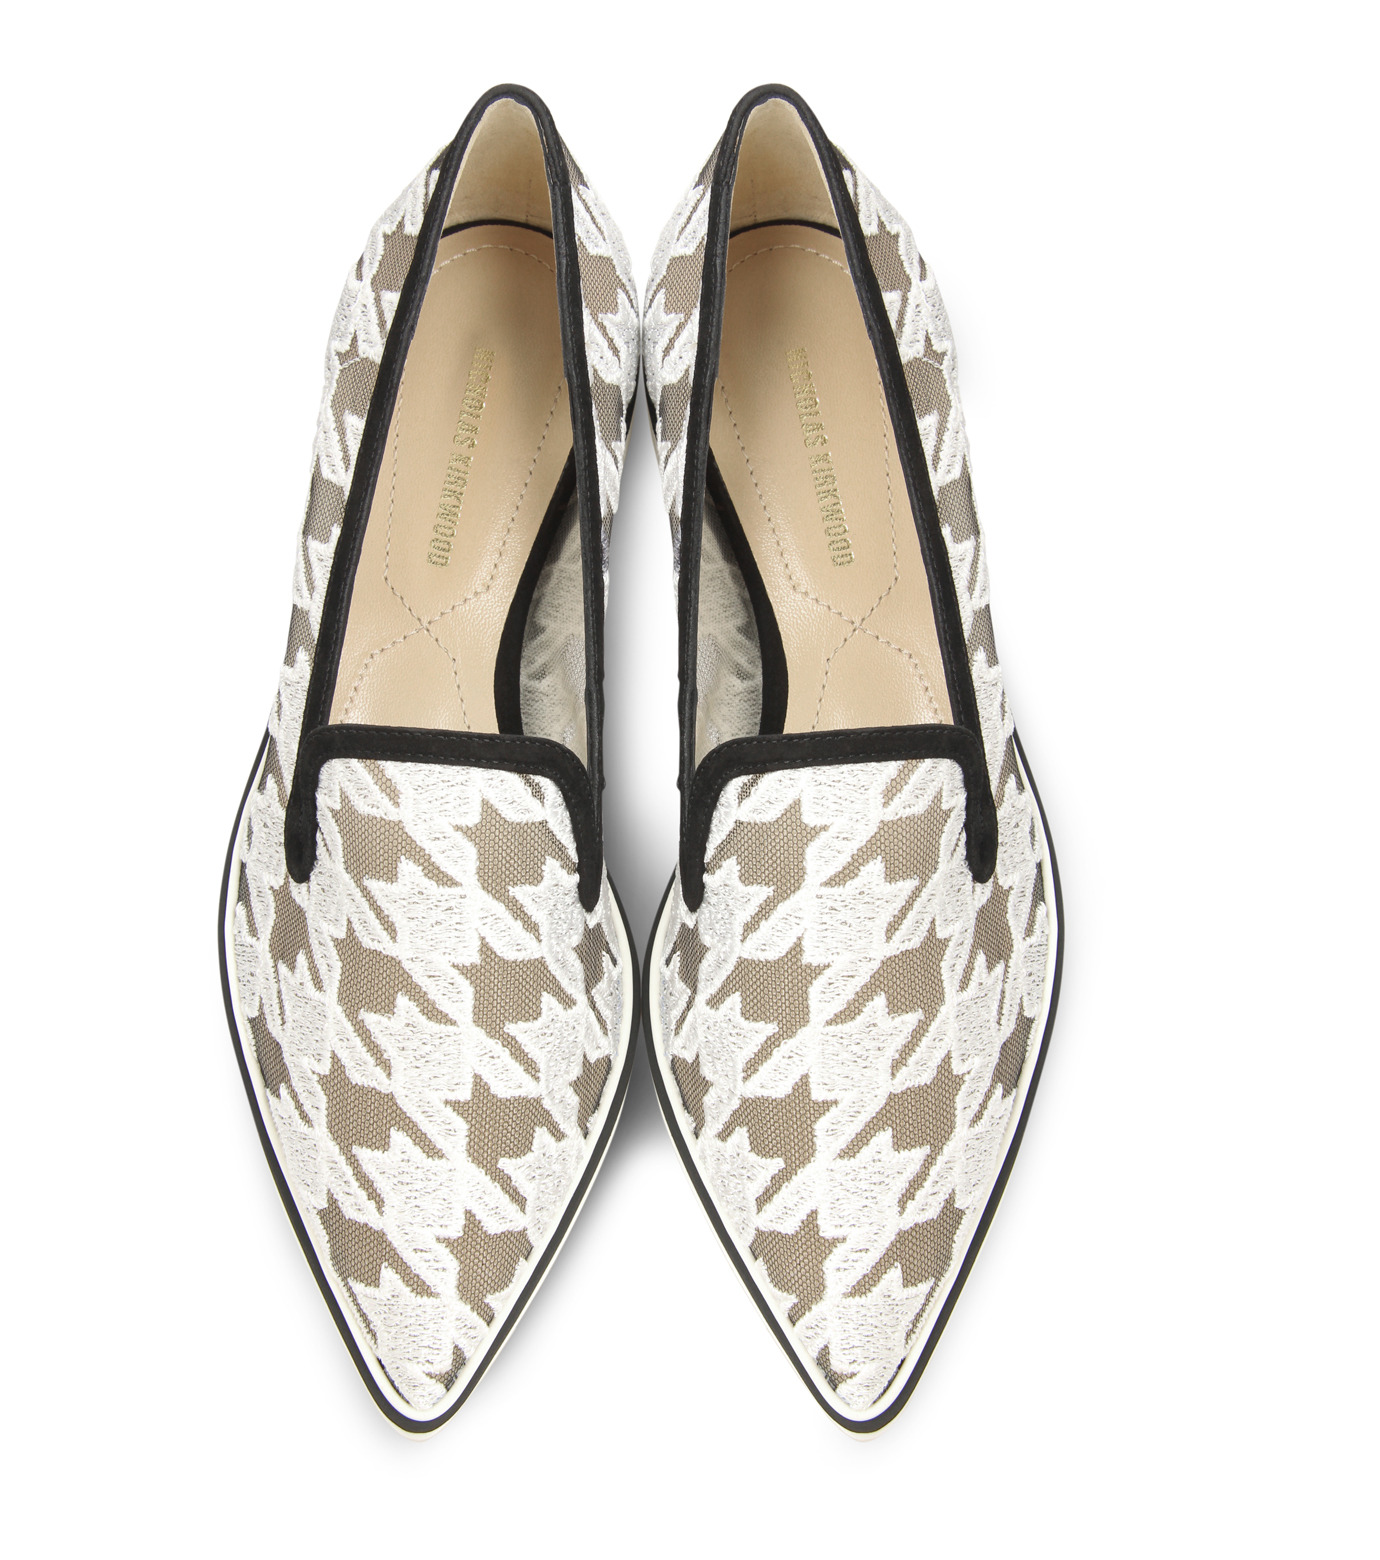 Nicholas  Kirkwood(ニコラス カークウッド)の35mm Alona Lace Loafer-WHITE(フラットシューズ/Flat shoes)-15A093-4 拡大詳細画像4